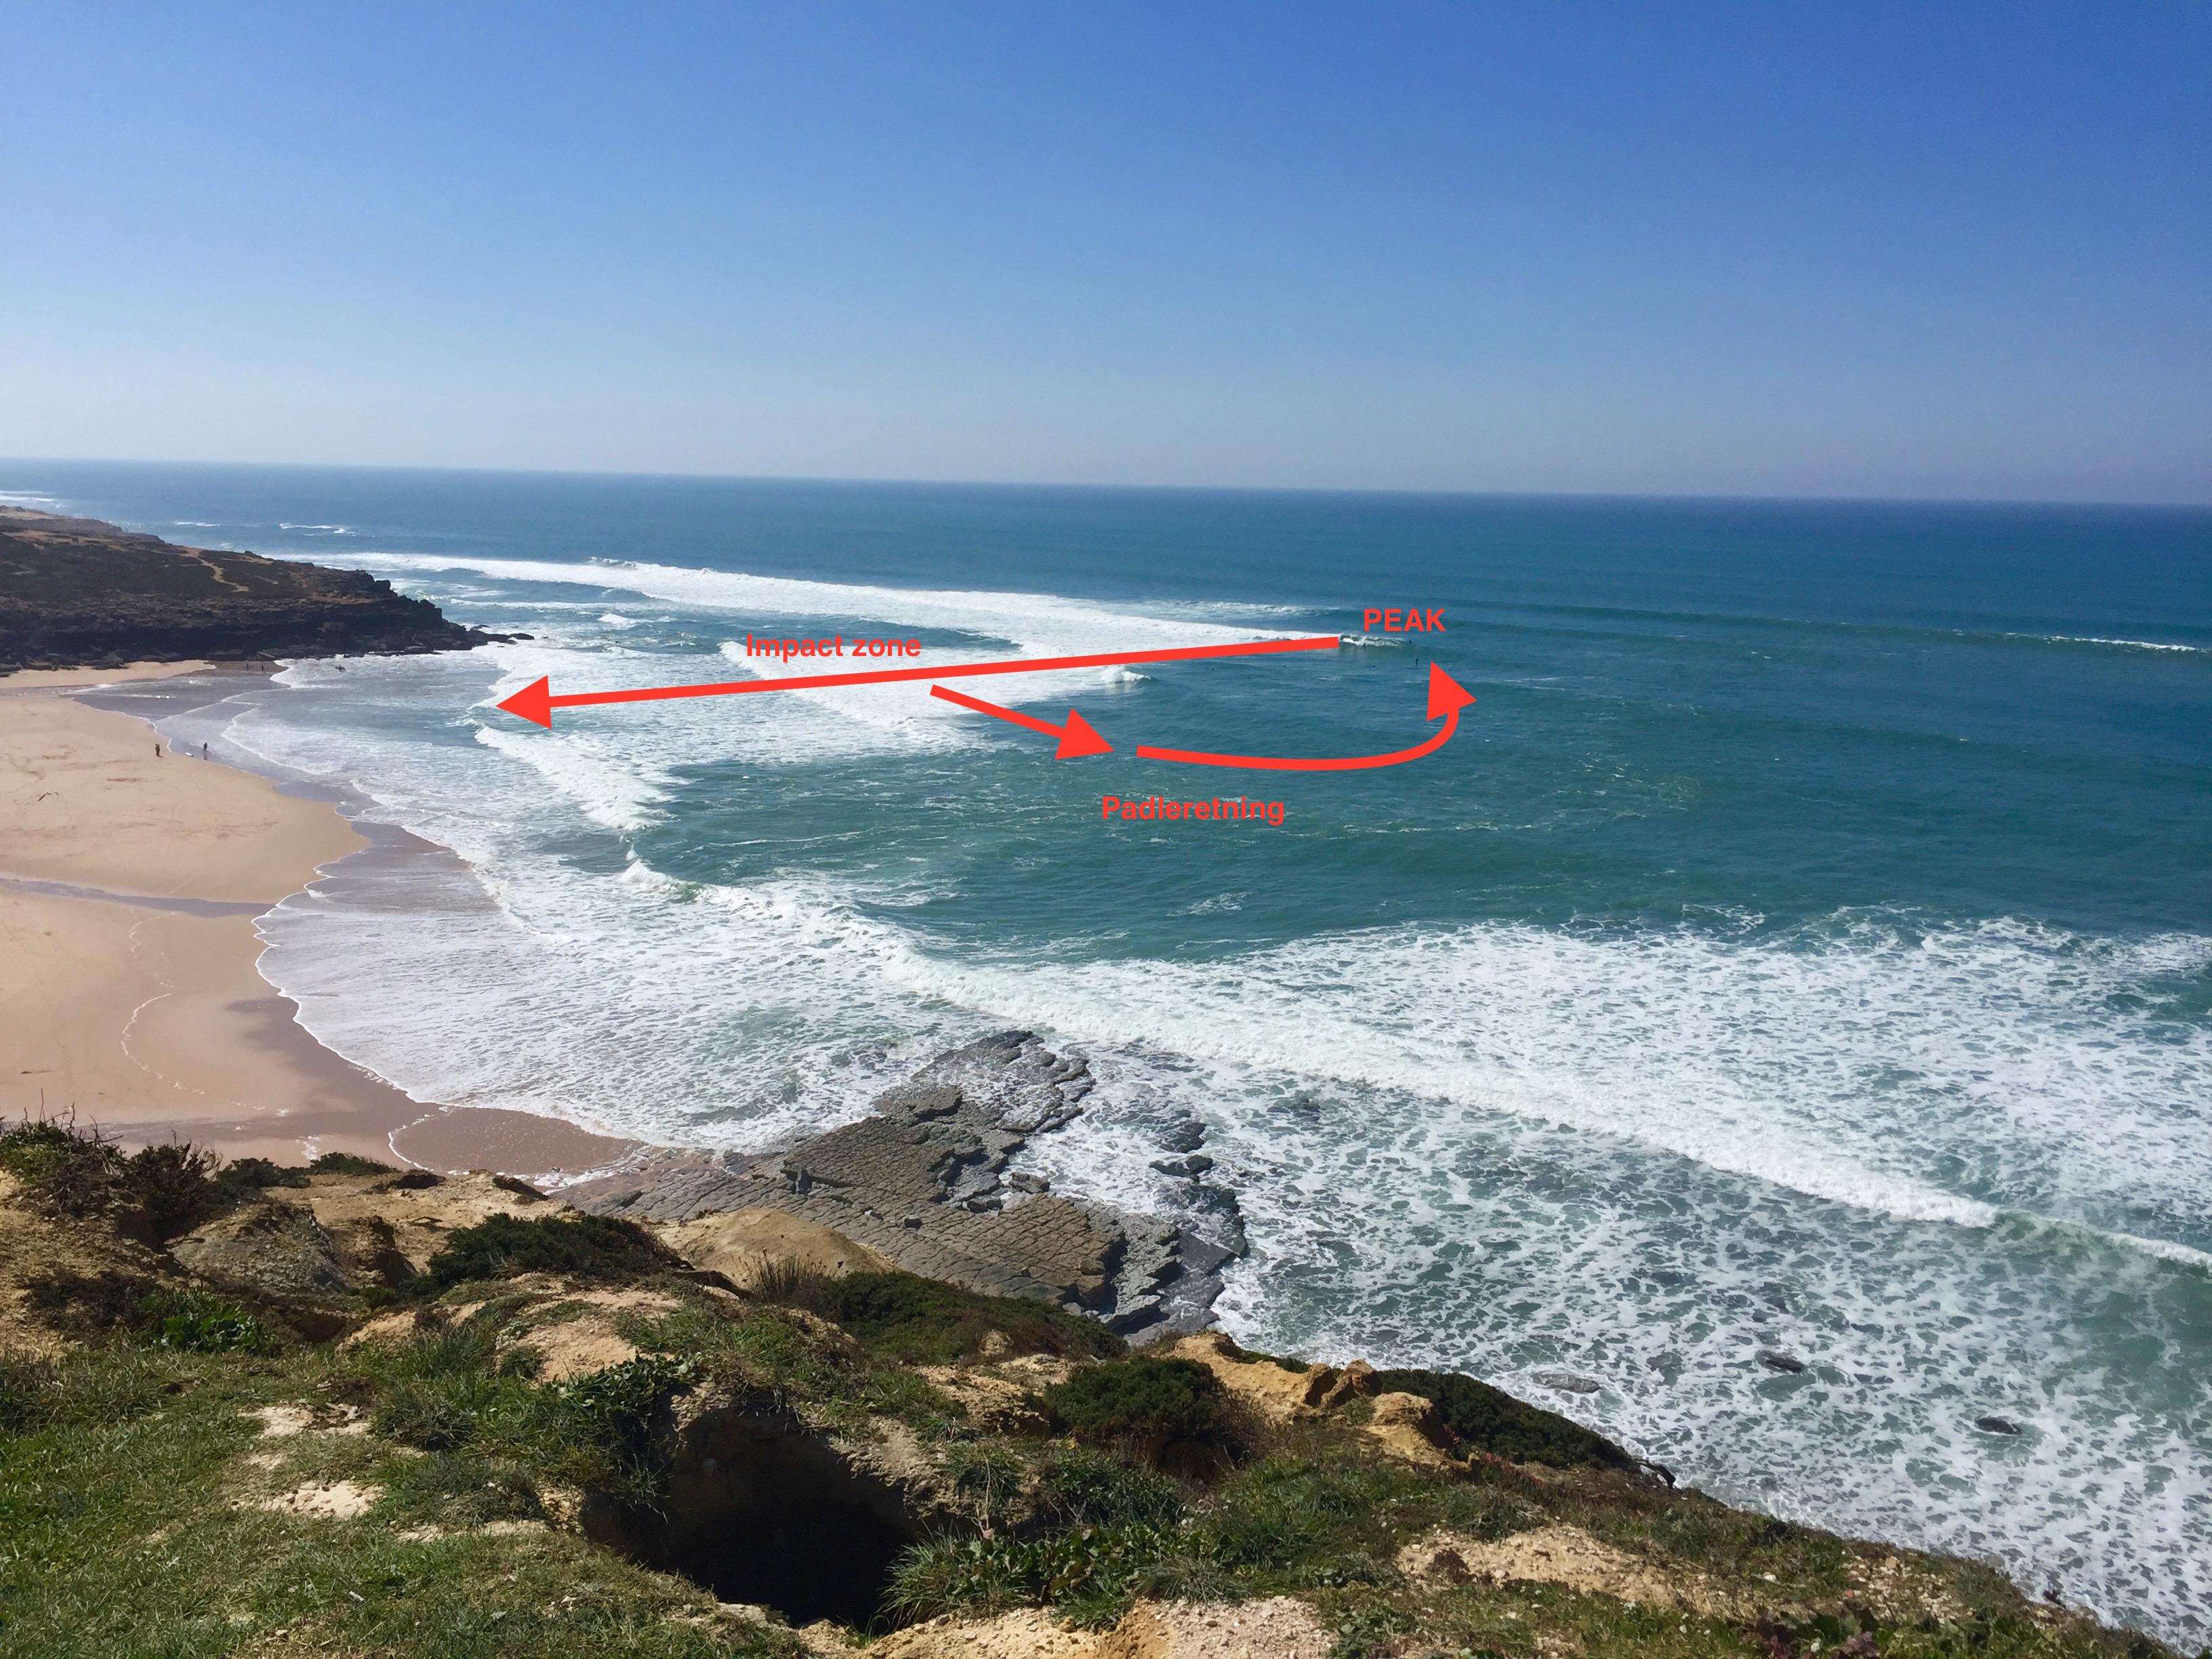 Impact zone og peak